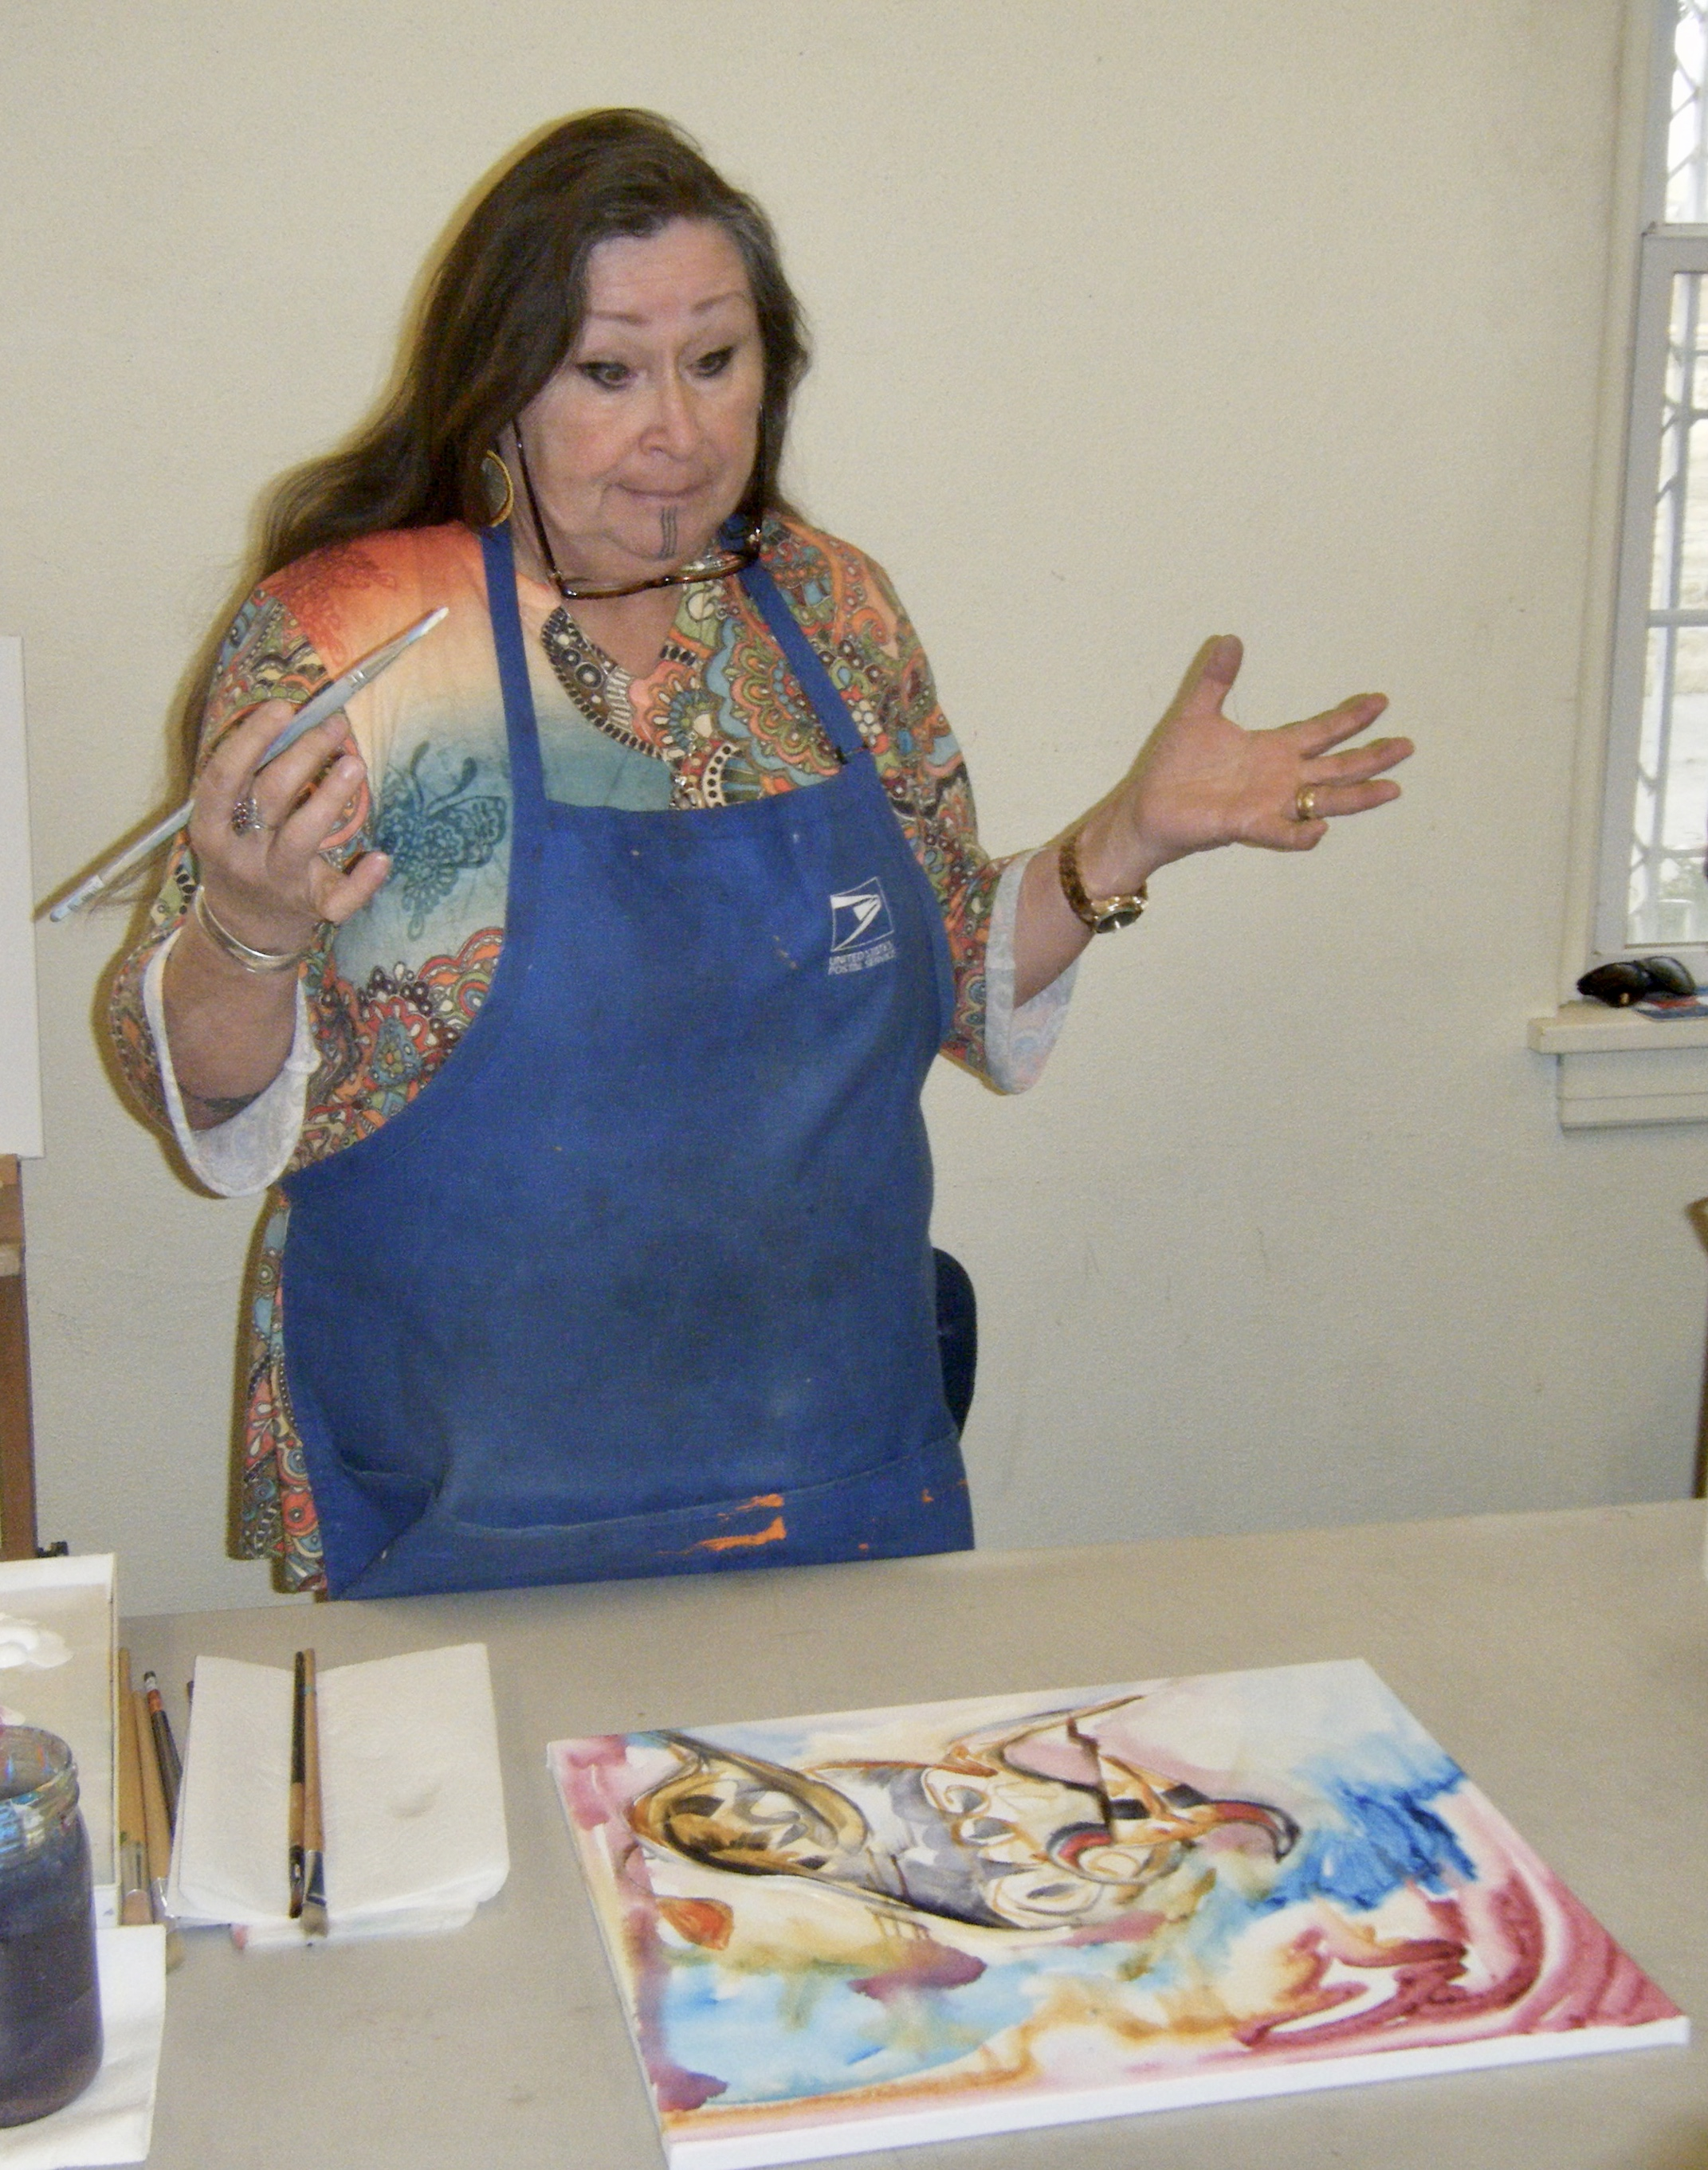 Blackfeet artist, Valentina LaPier teaches techniques and design during the Acrylic Painting Workshop.